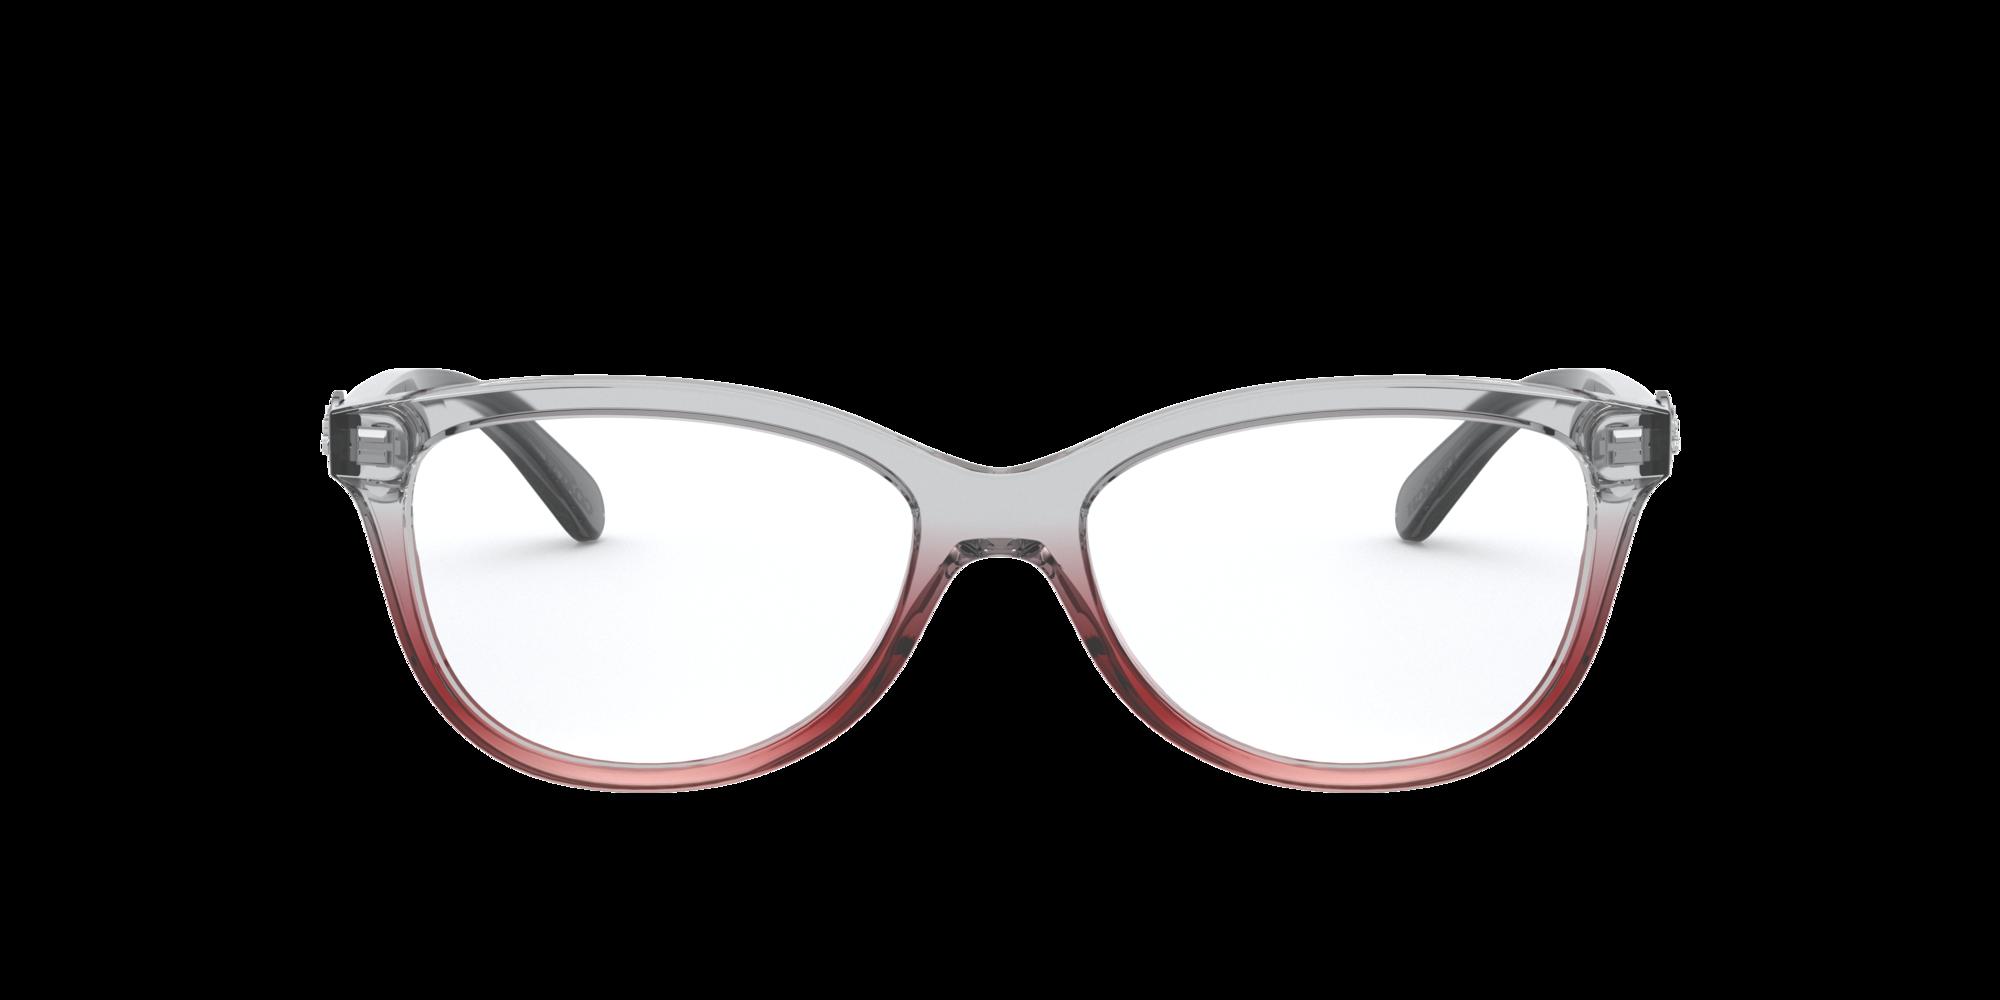 Image for HC6155 from LensCrafters | Glasses, Prescription Glasses Online, Eyewear